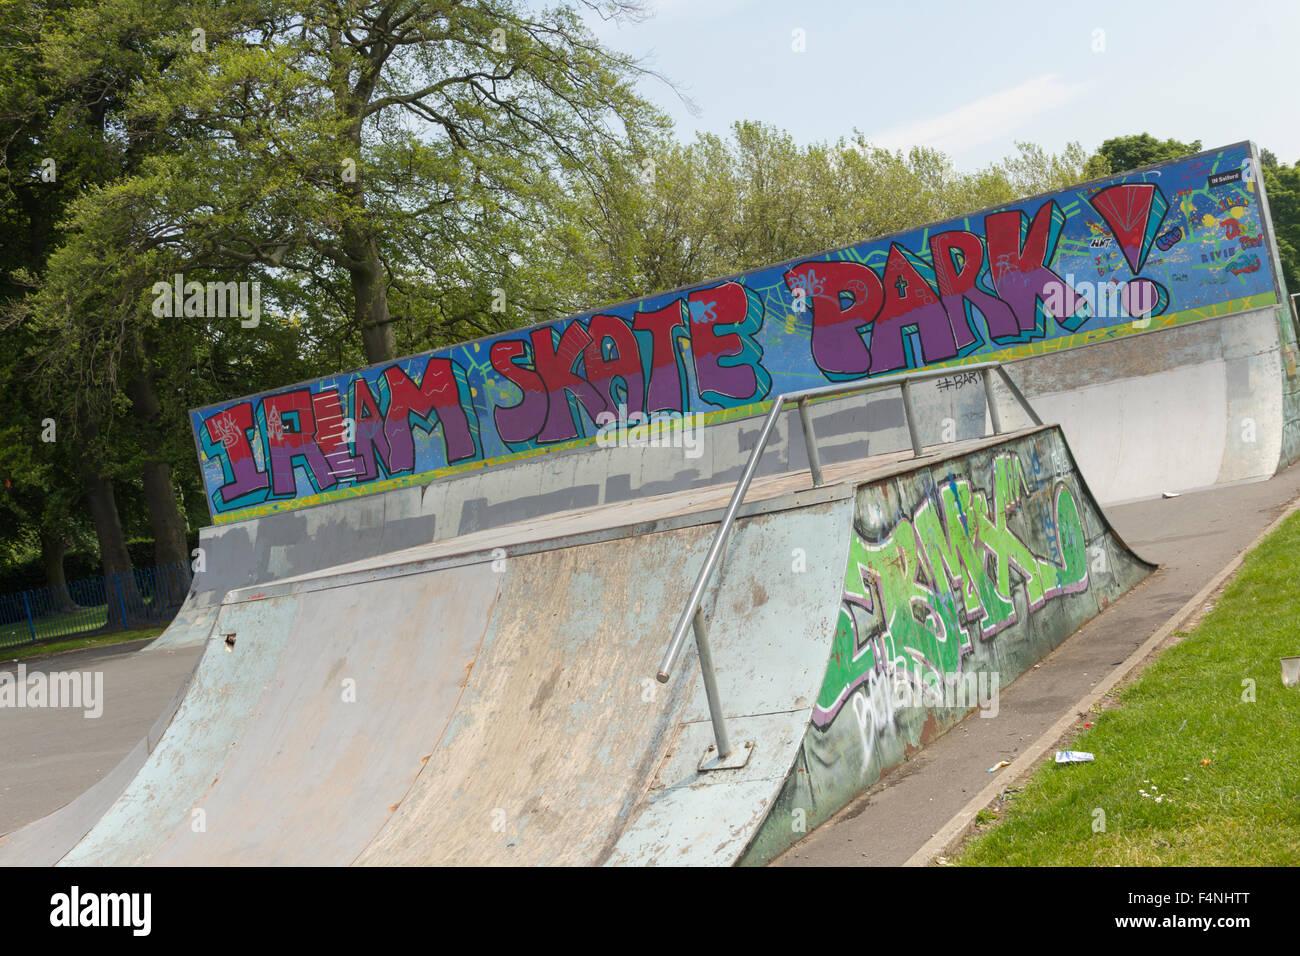 Irlam Skate Park, Irlam, Greater Manchester. - Stock Image